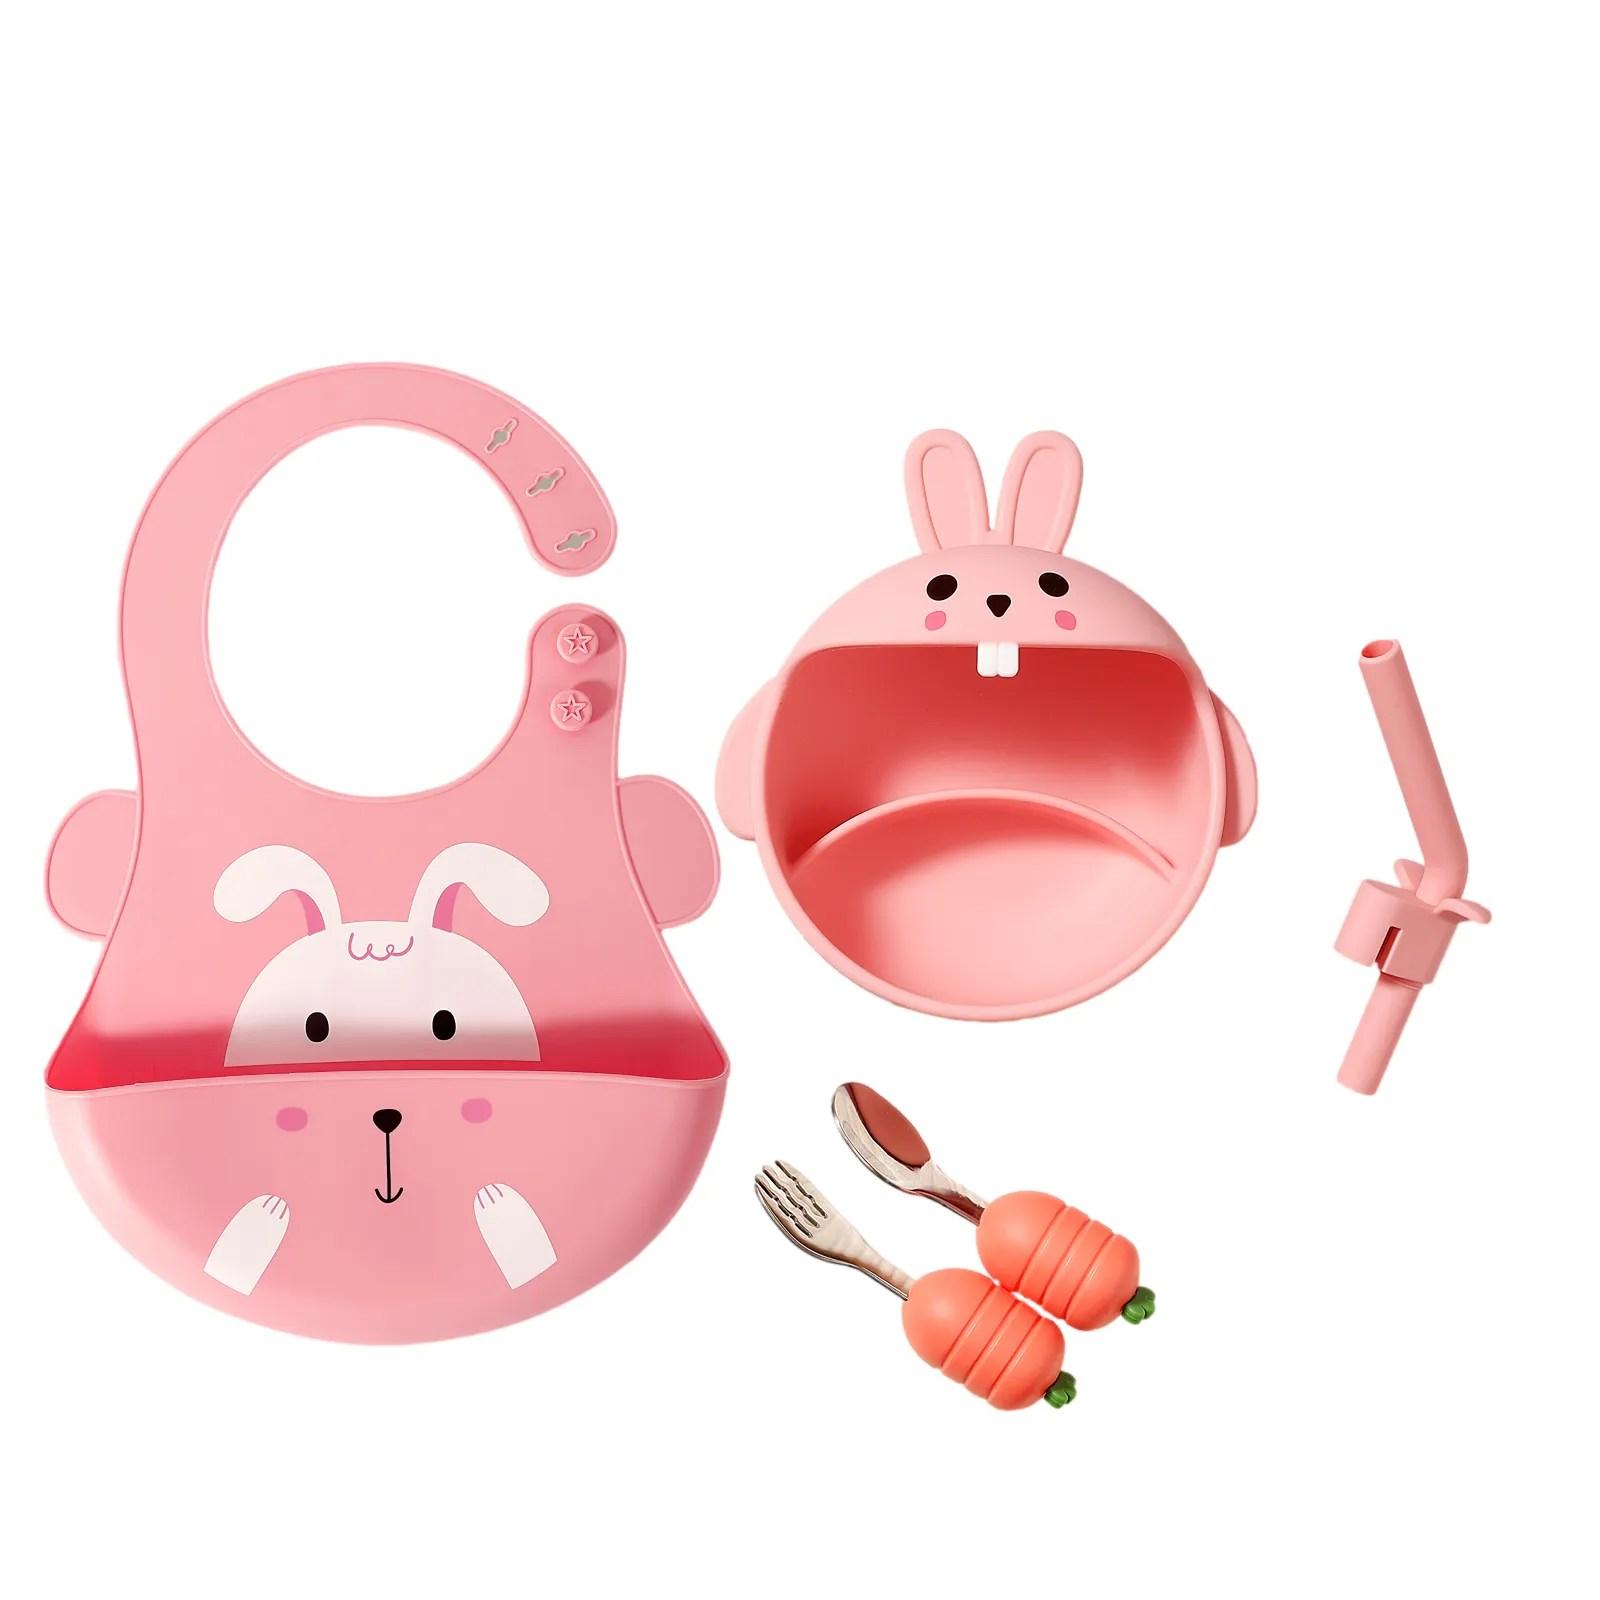 Silicone baby Feeding Set A Set of 5 (Rabbit-pink)